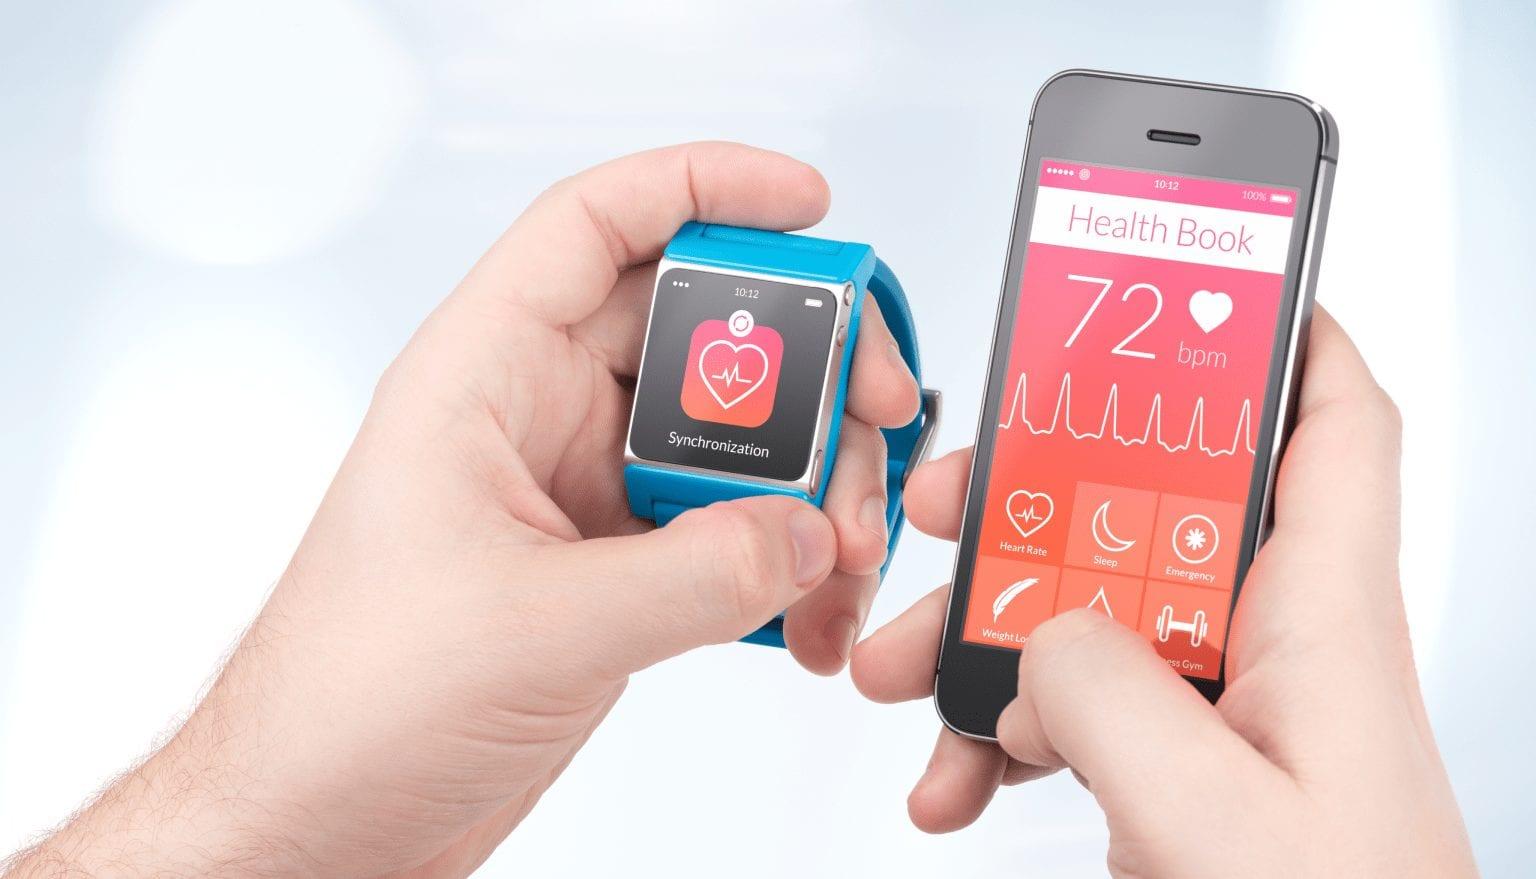 Smart Health Watches